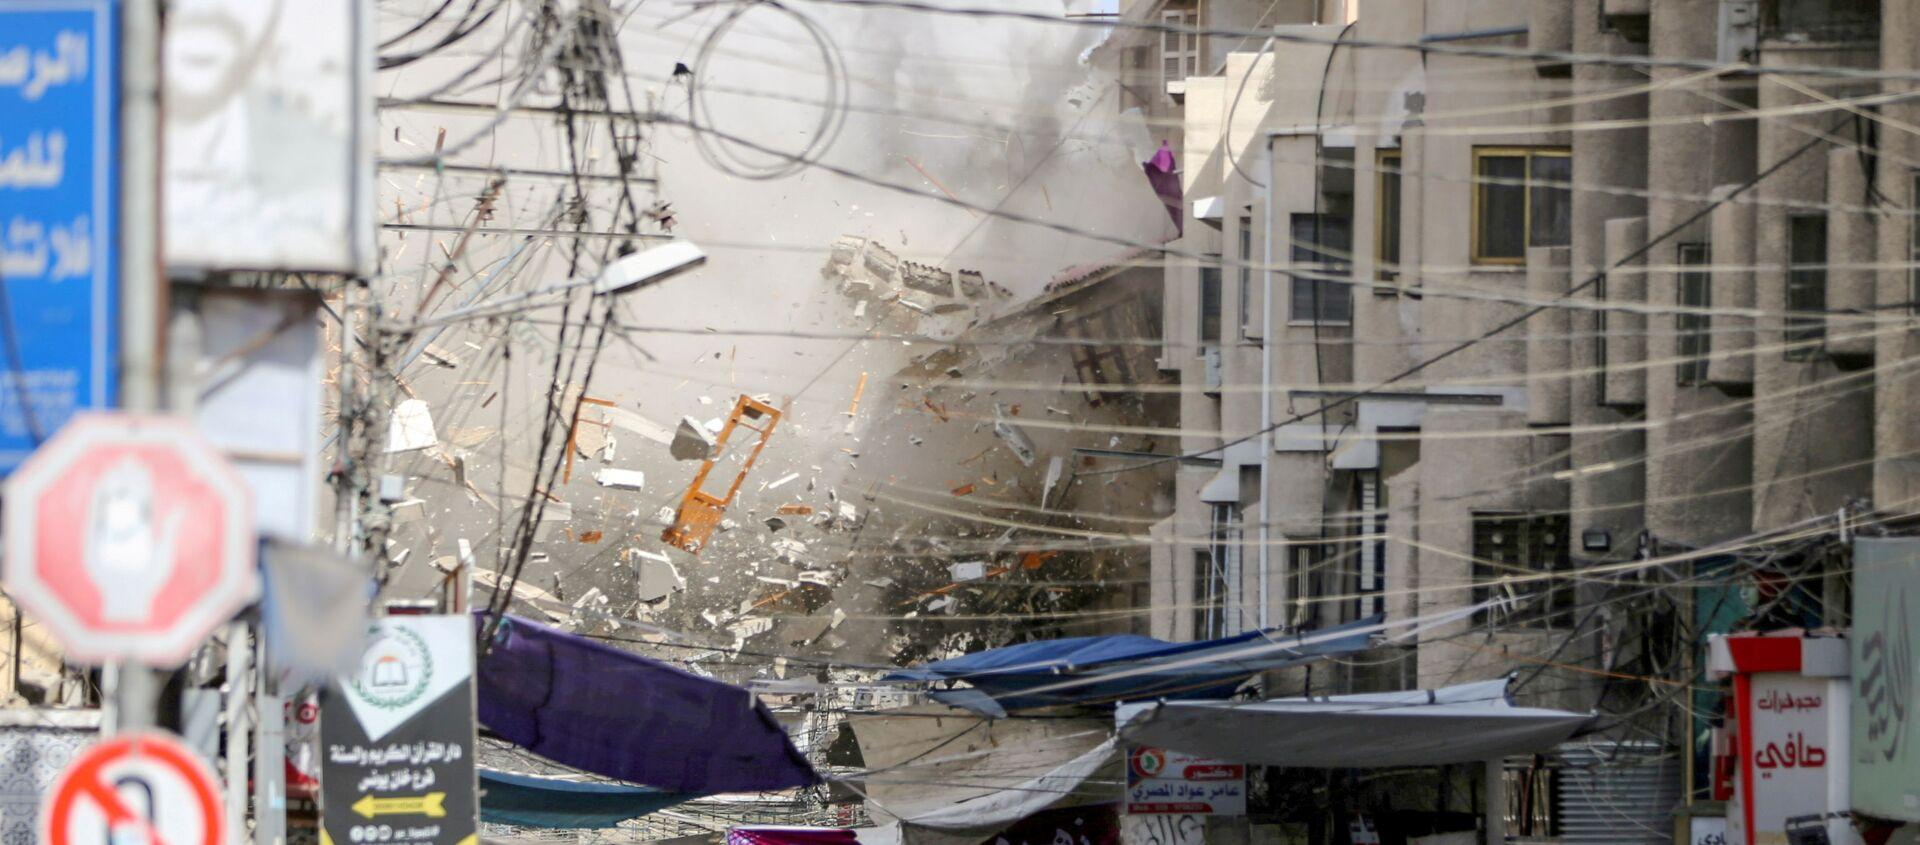 Debris fly as smoke rises following an Israeli air strike, amid Israeli-Palestinian fighting, in Khan Younis in the southern Gaza Strip, May 20, 2021. REUTERS/Ibraheem Abu Mustafa  - Sputnik International, 1920